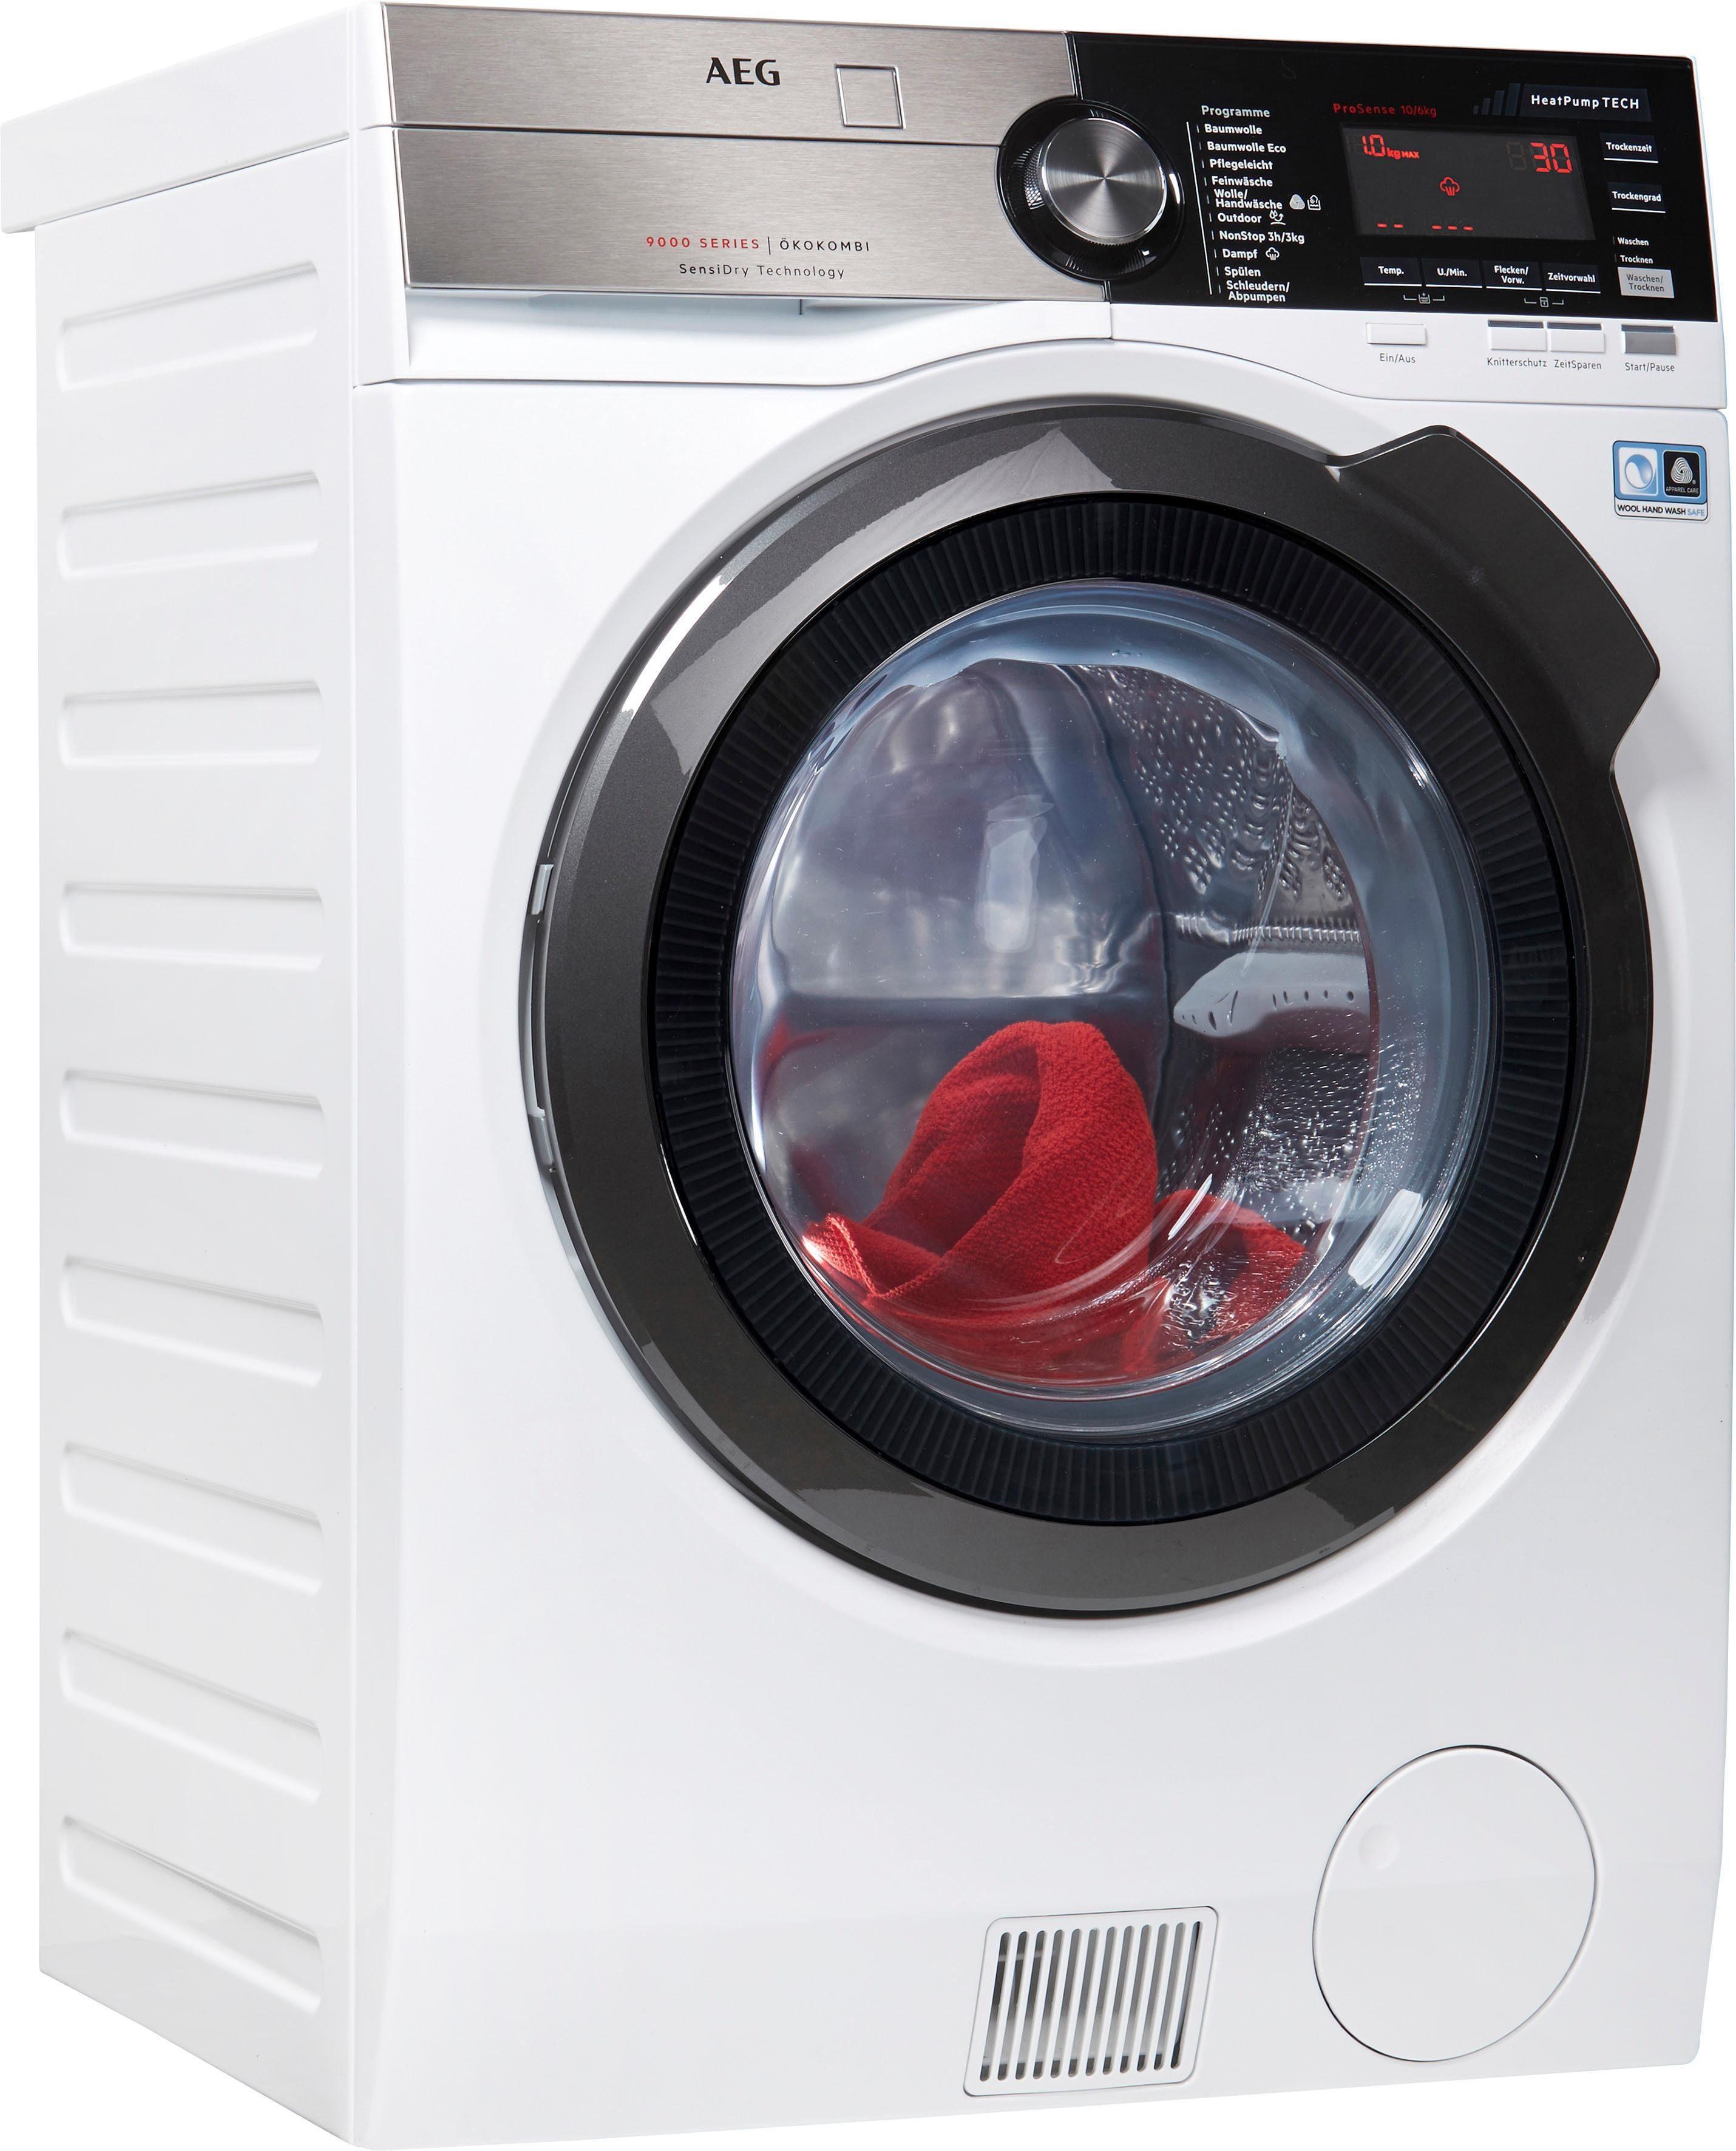 AEG Waschtrockner 9000, 10 kg/6 kg, 1600 U/Min